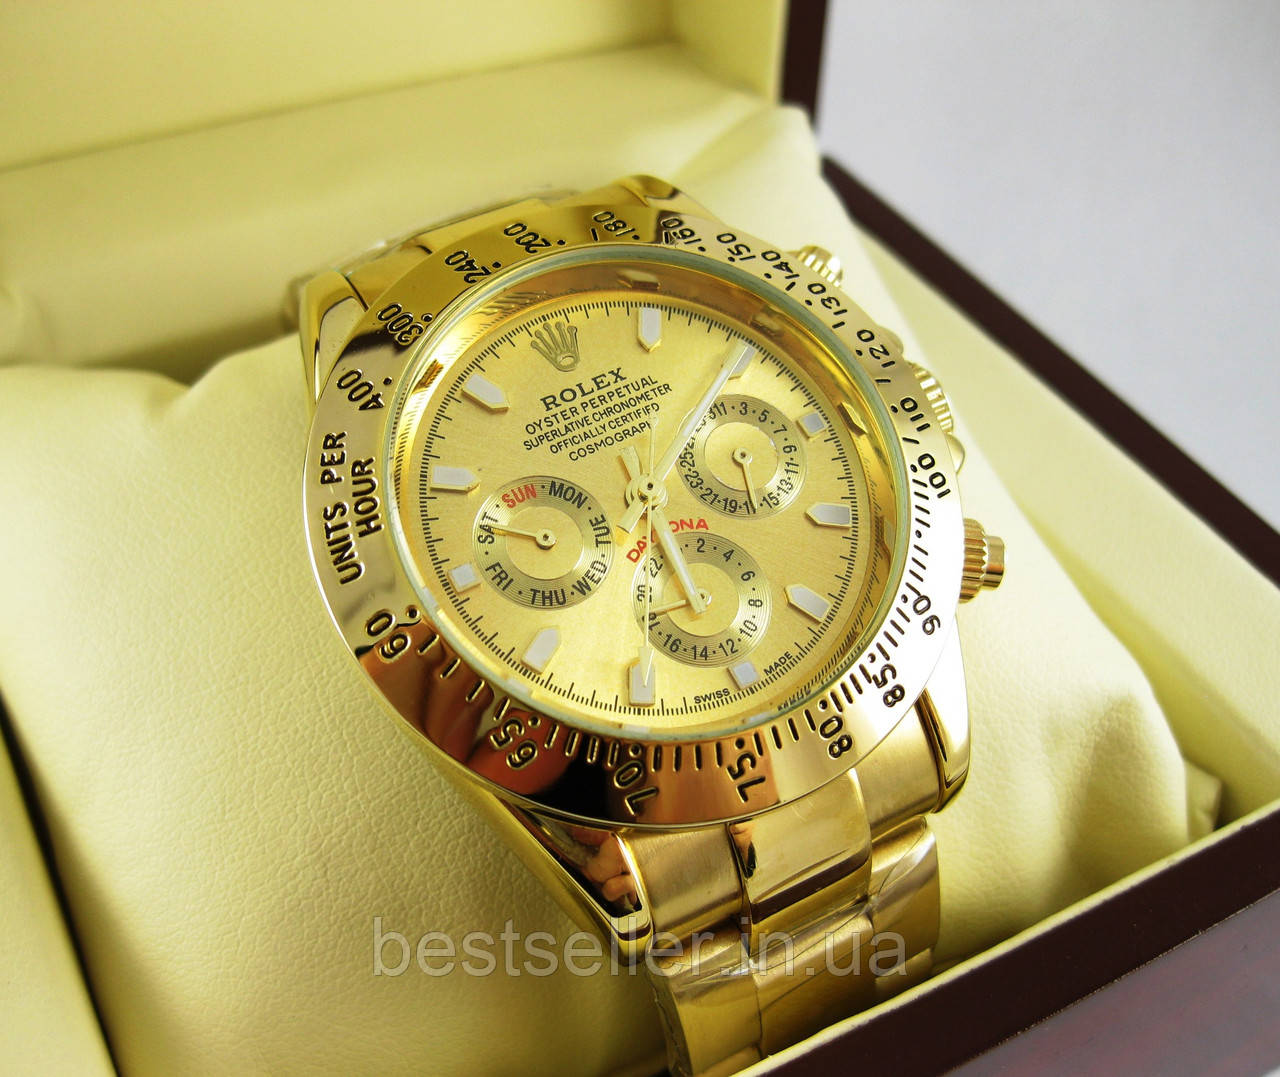 823e7ab67200 Часы Rolex Daytona 40mm All Gold (Механика). Replica  Качественные ...